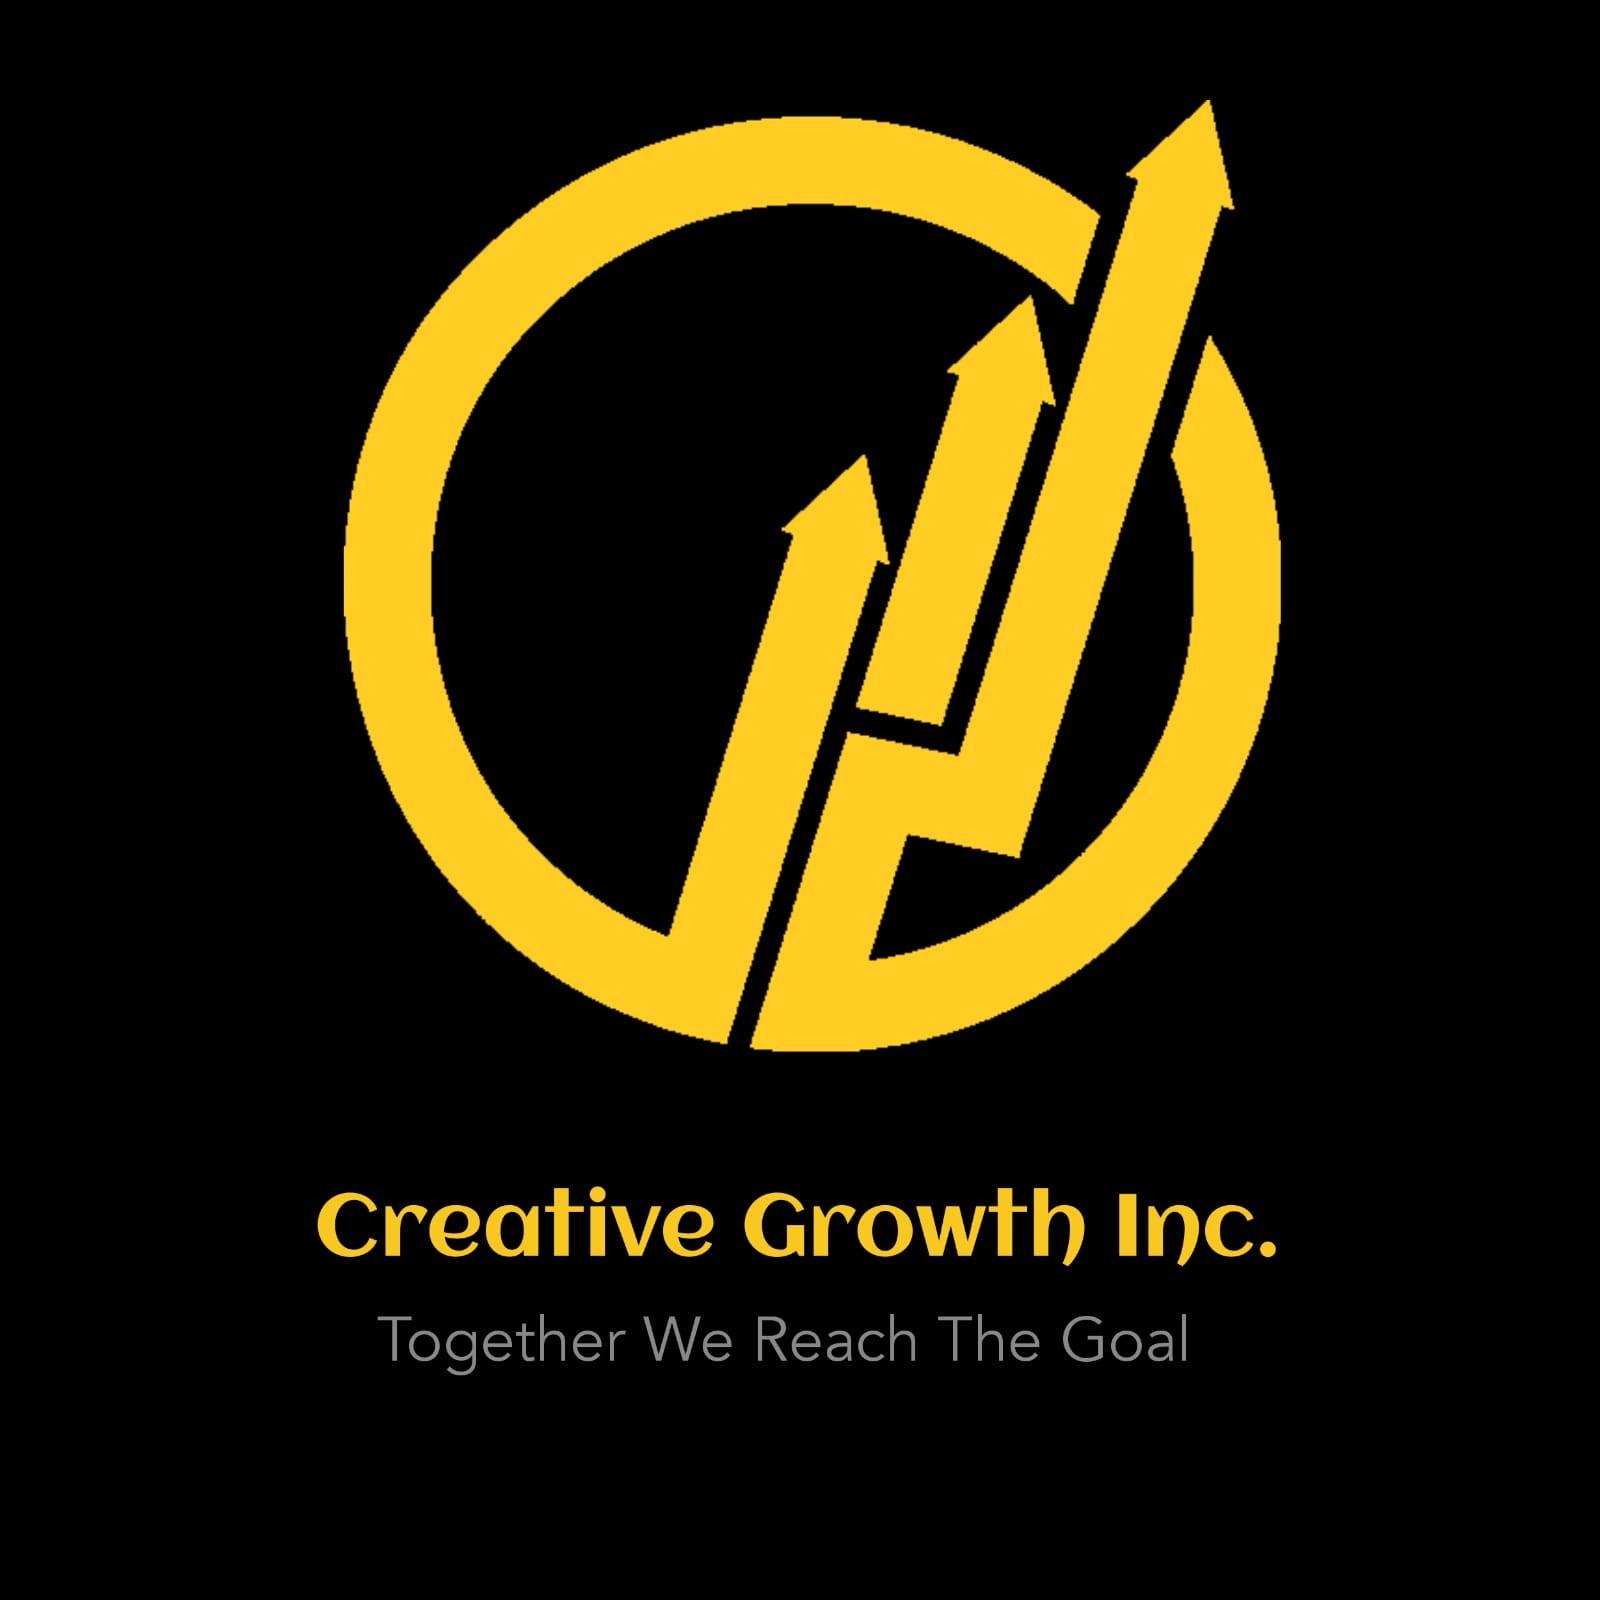 https://www.mncjobs.co.za/company/creative-growth-inc